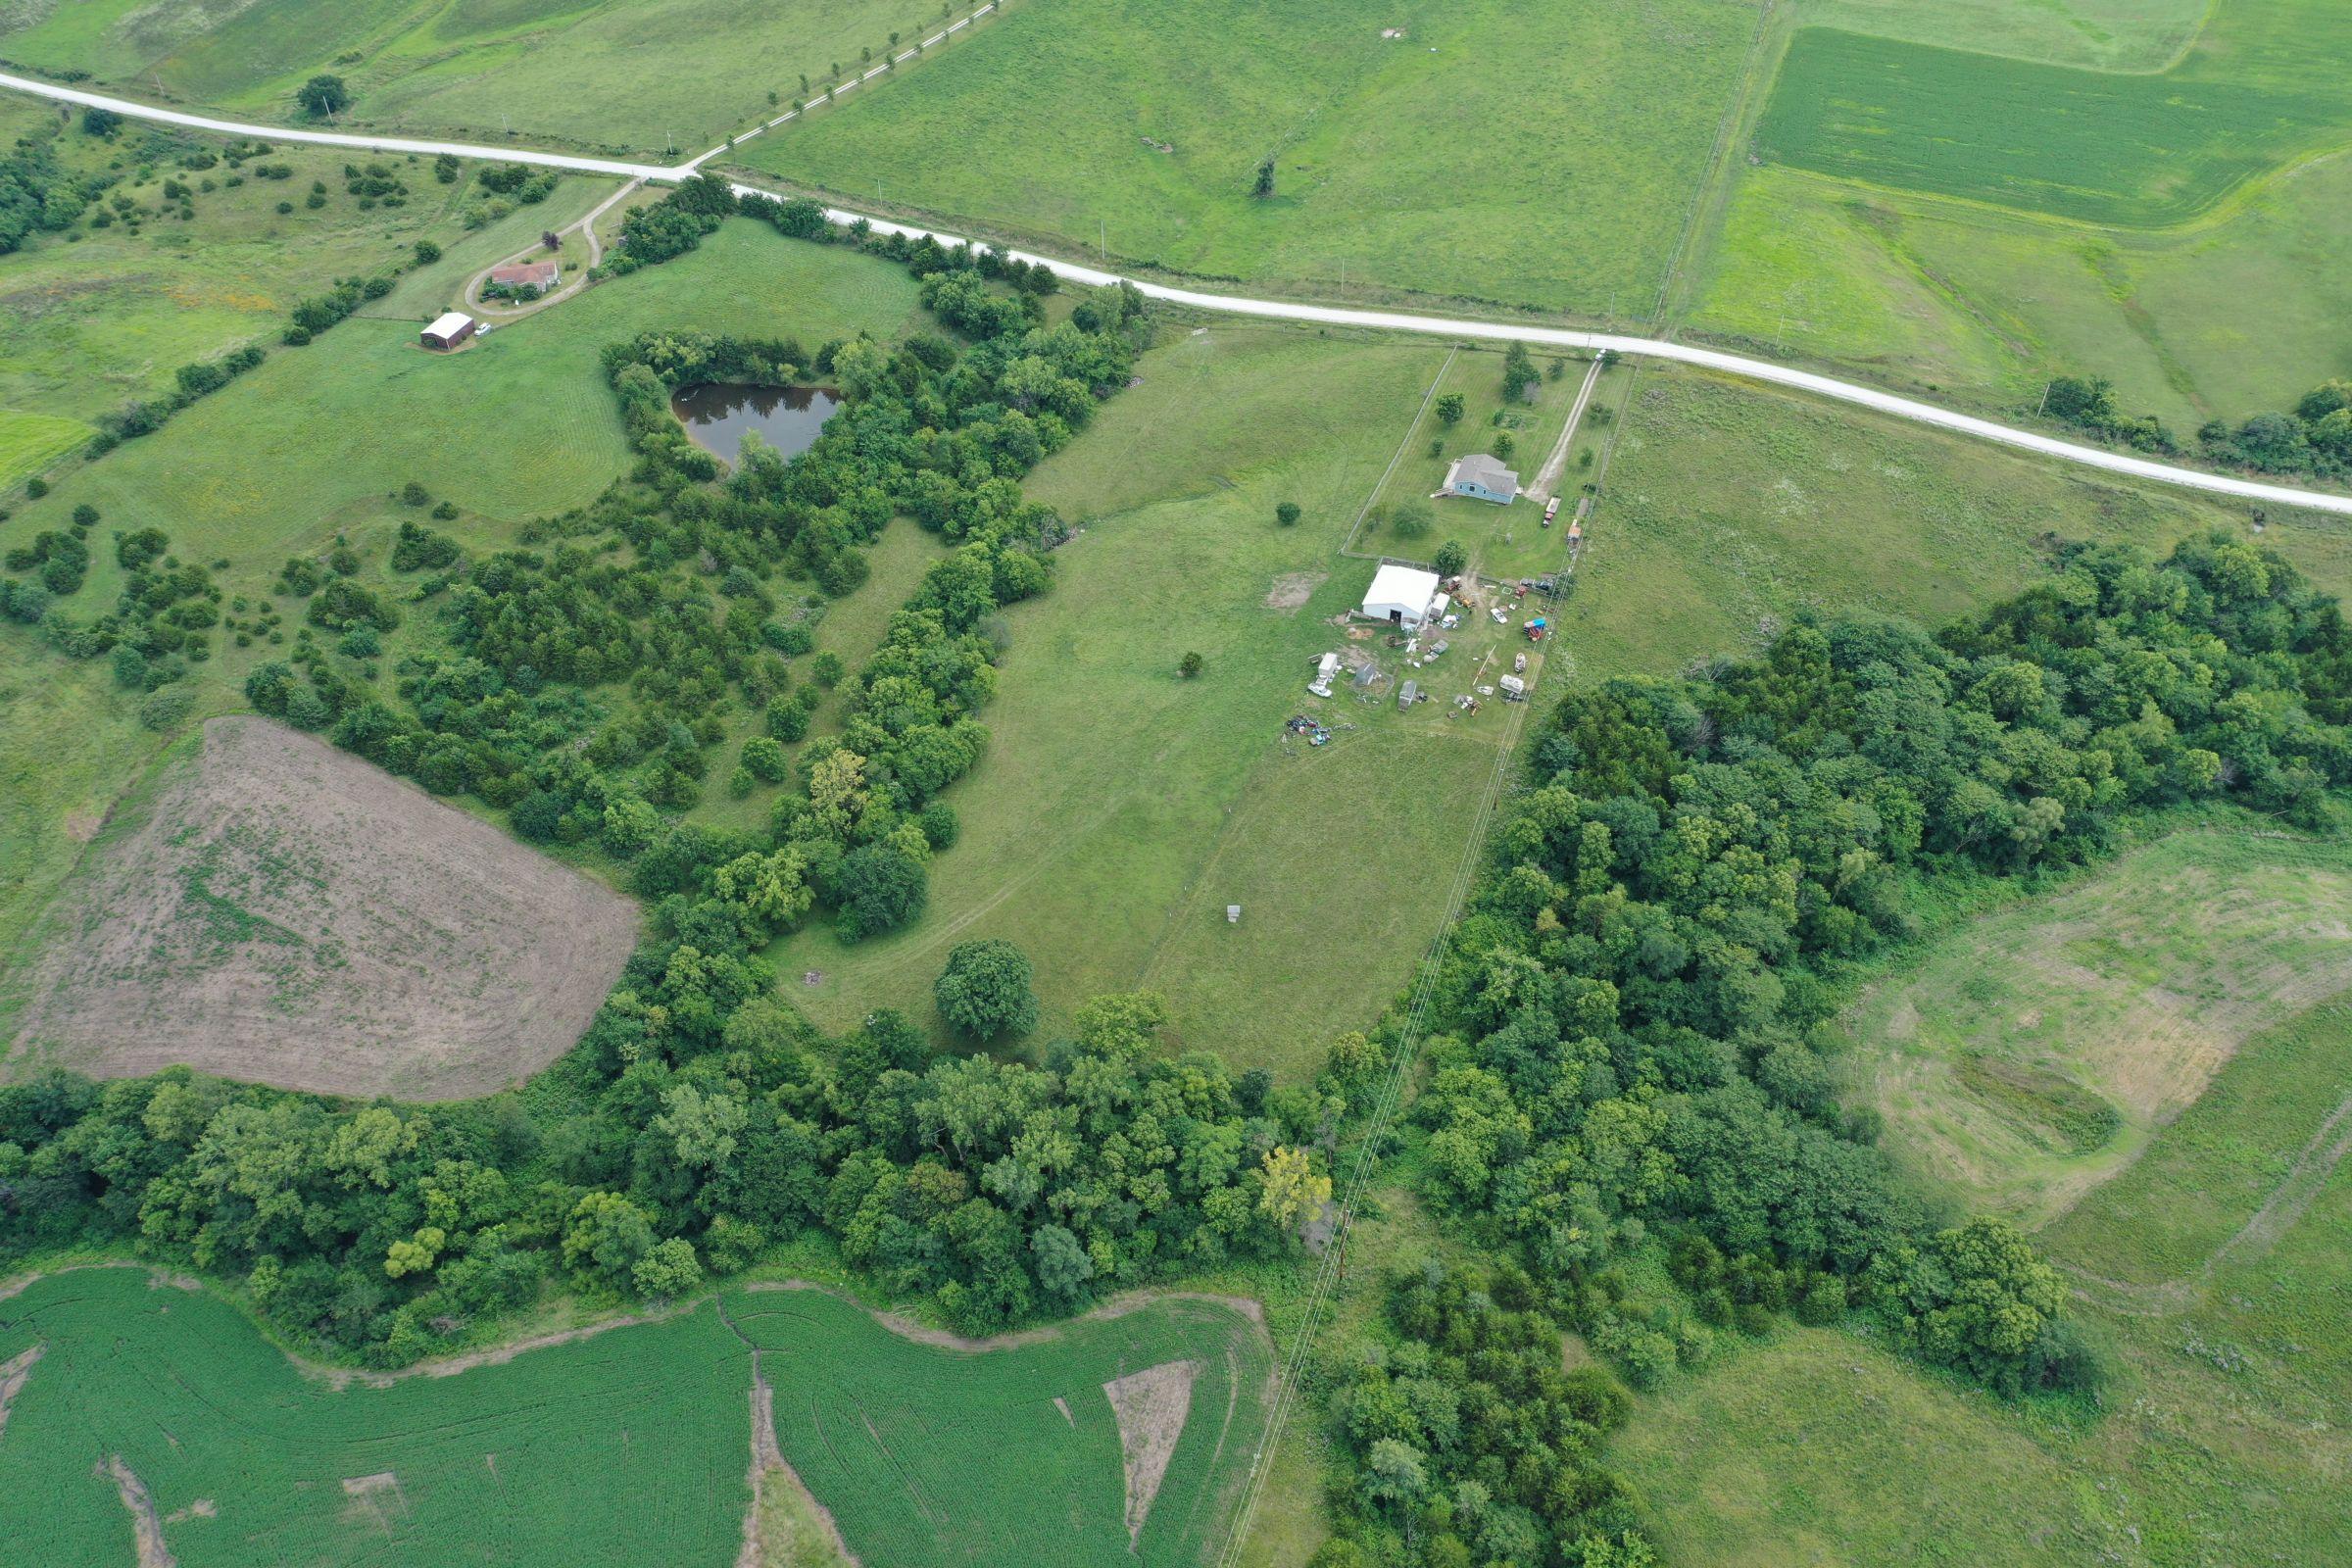 residential-warren-county-iowa-12-acres-listing-number-15104-4-2020-08-08-184814.jpg